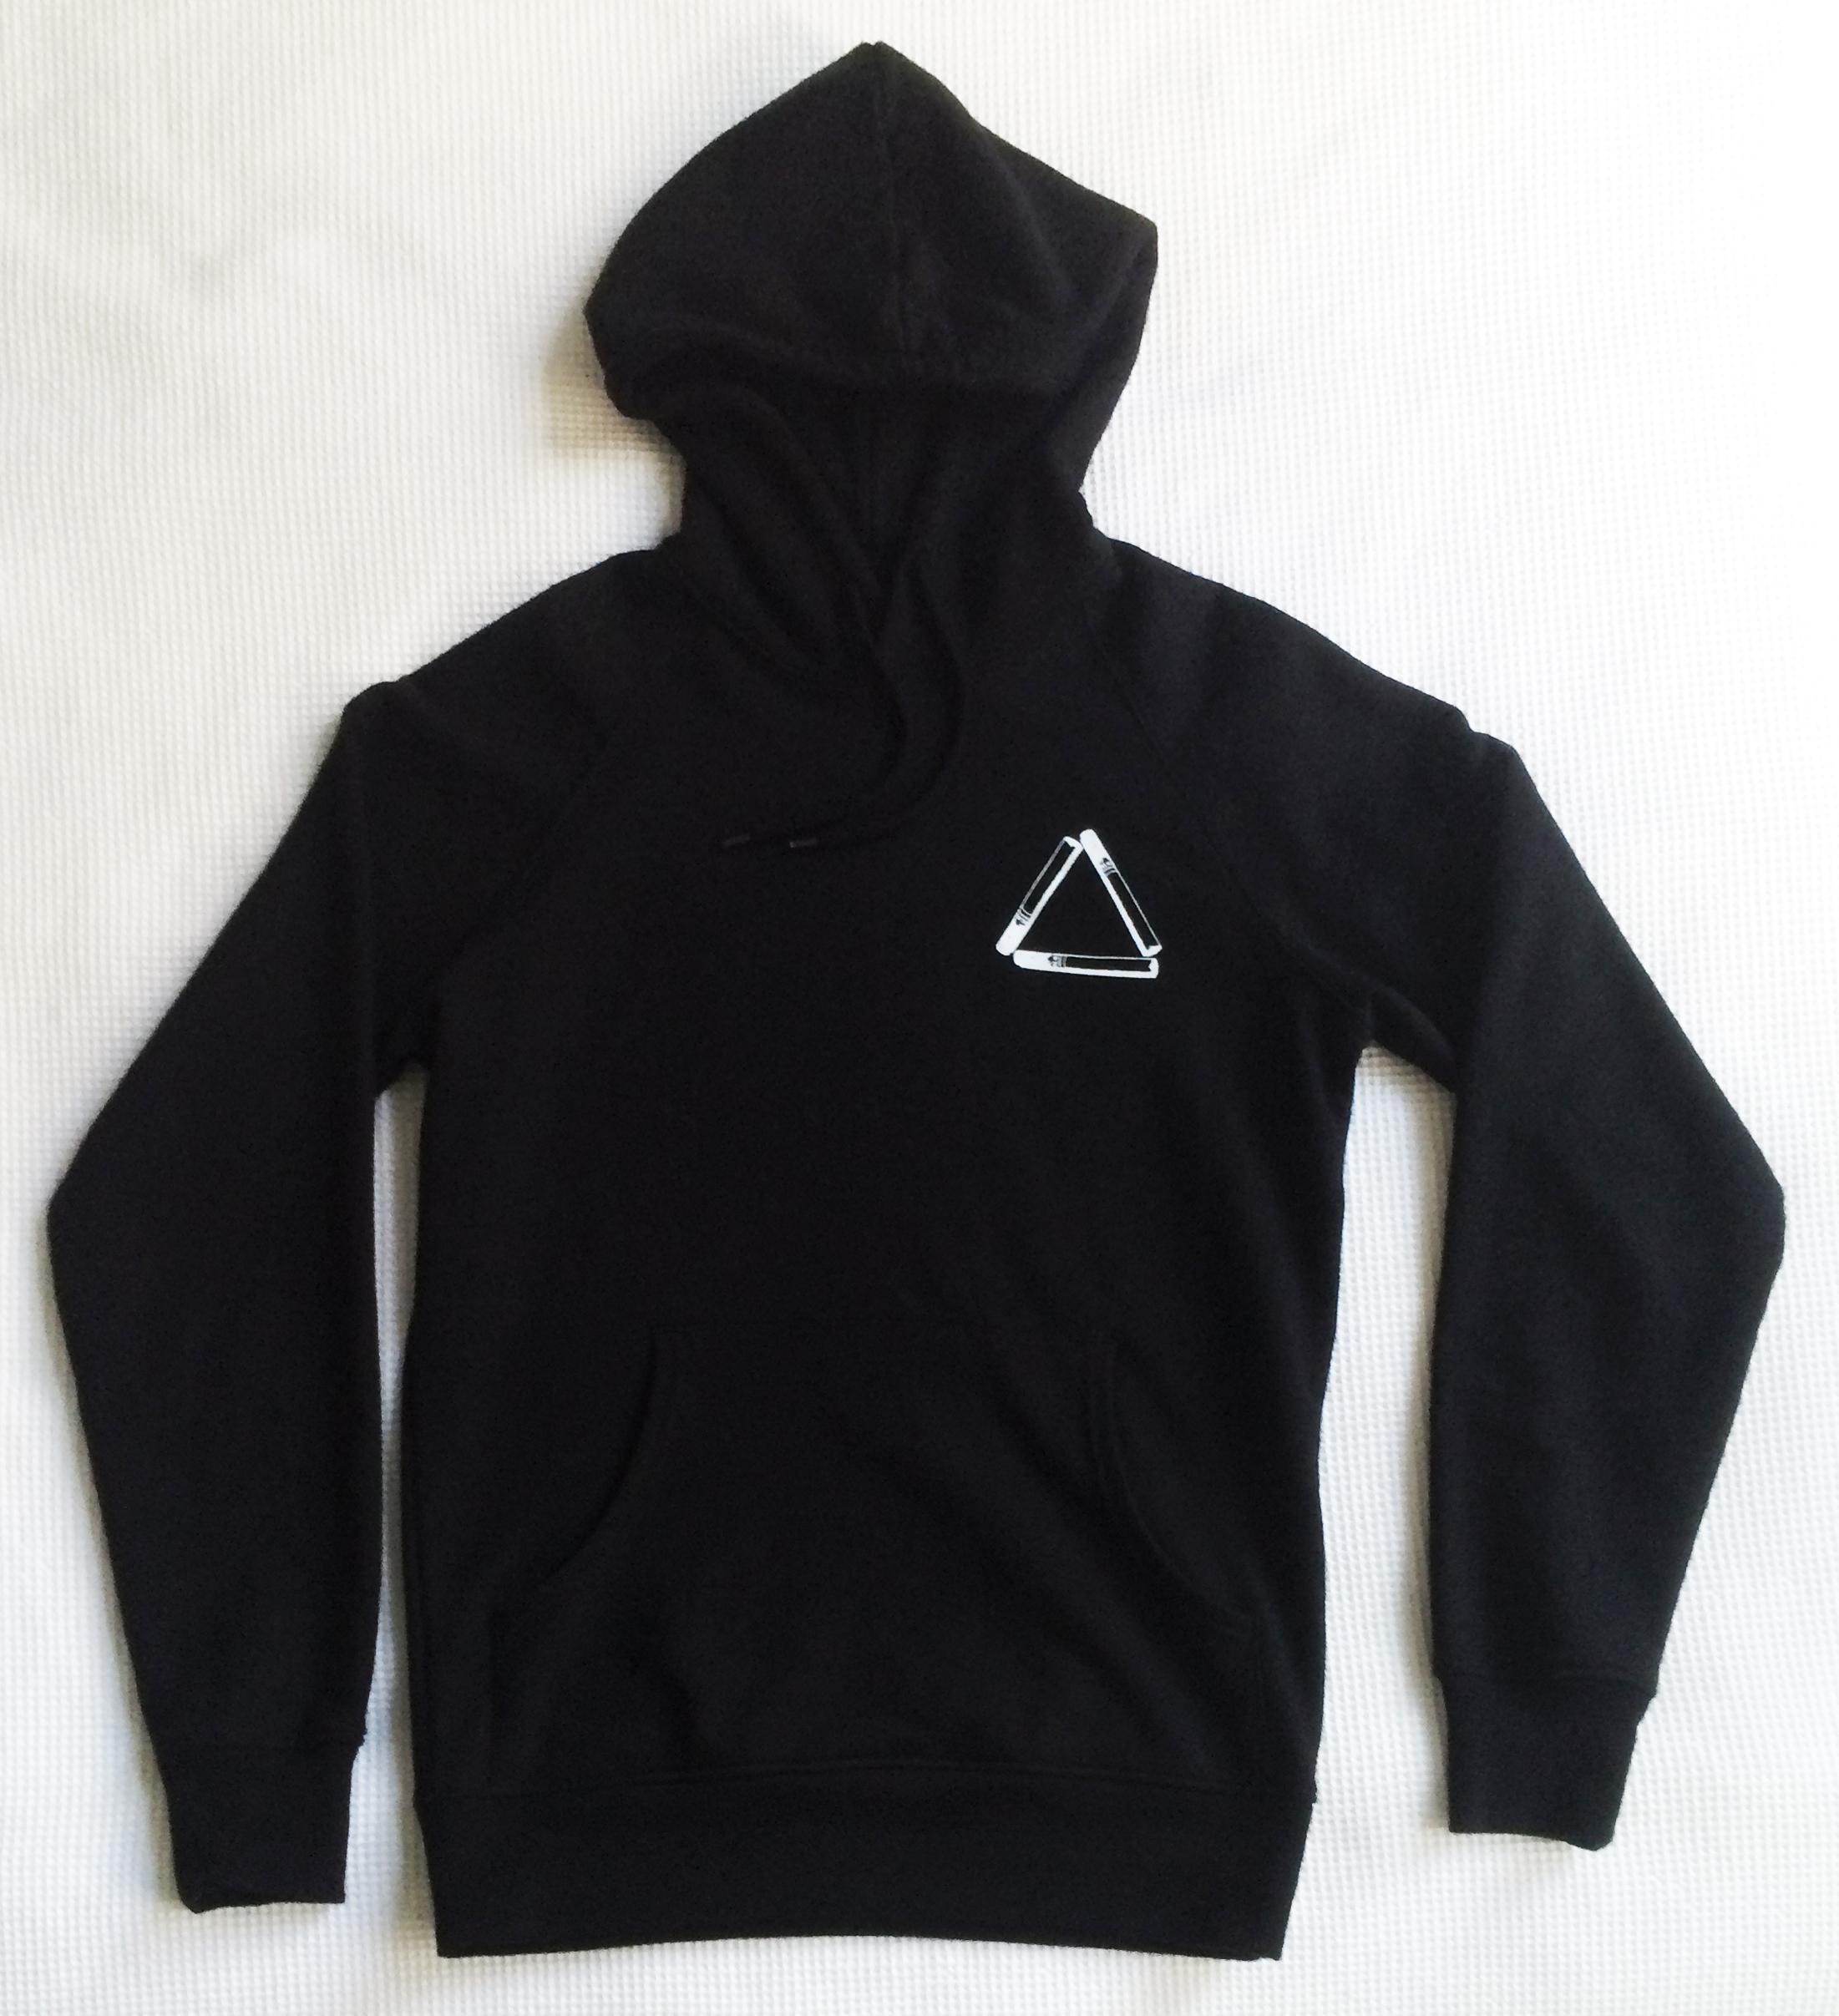 3dfca7b8b372 Palace Palace - Tri Smoke Hoodie Black Size s - Sweatshirts   Hoodies for  Sale - Grailed